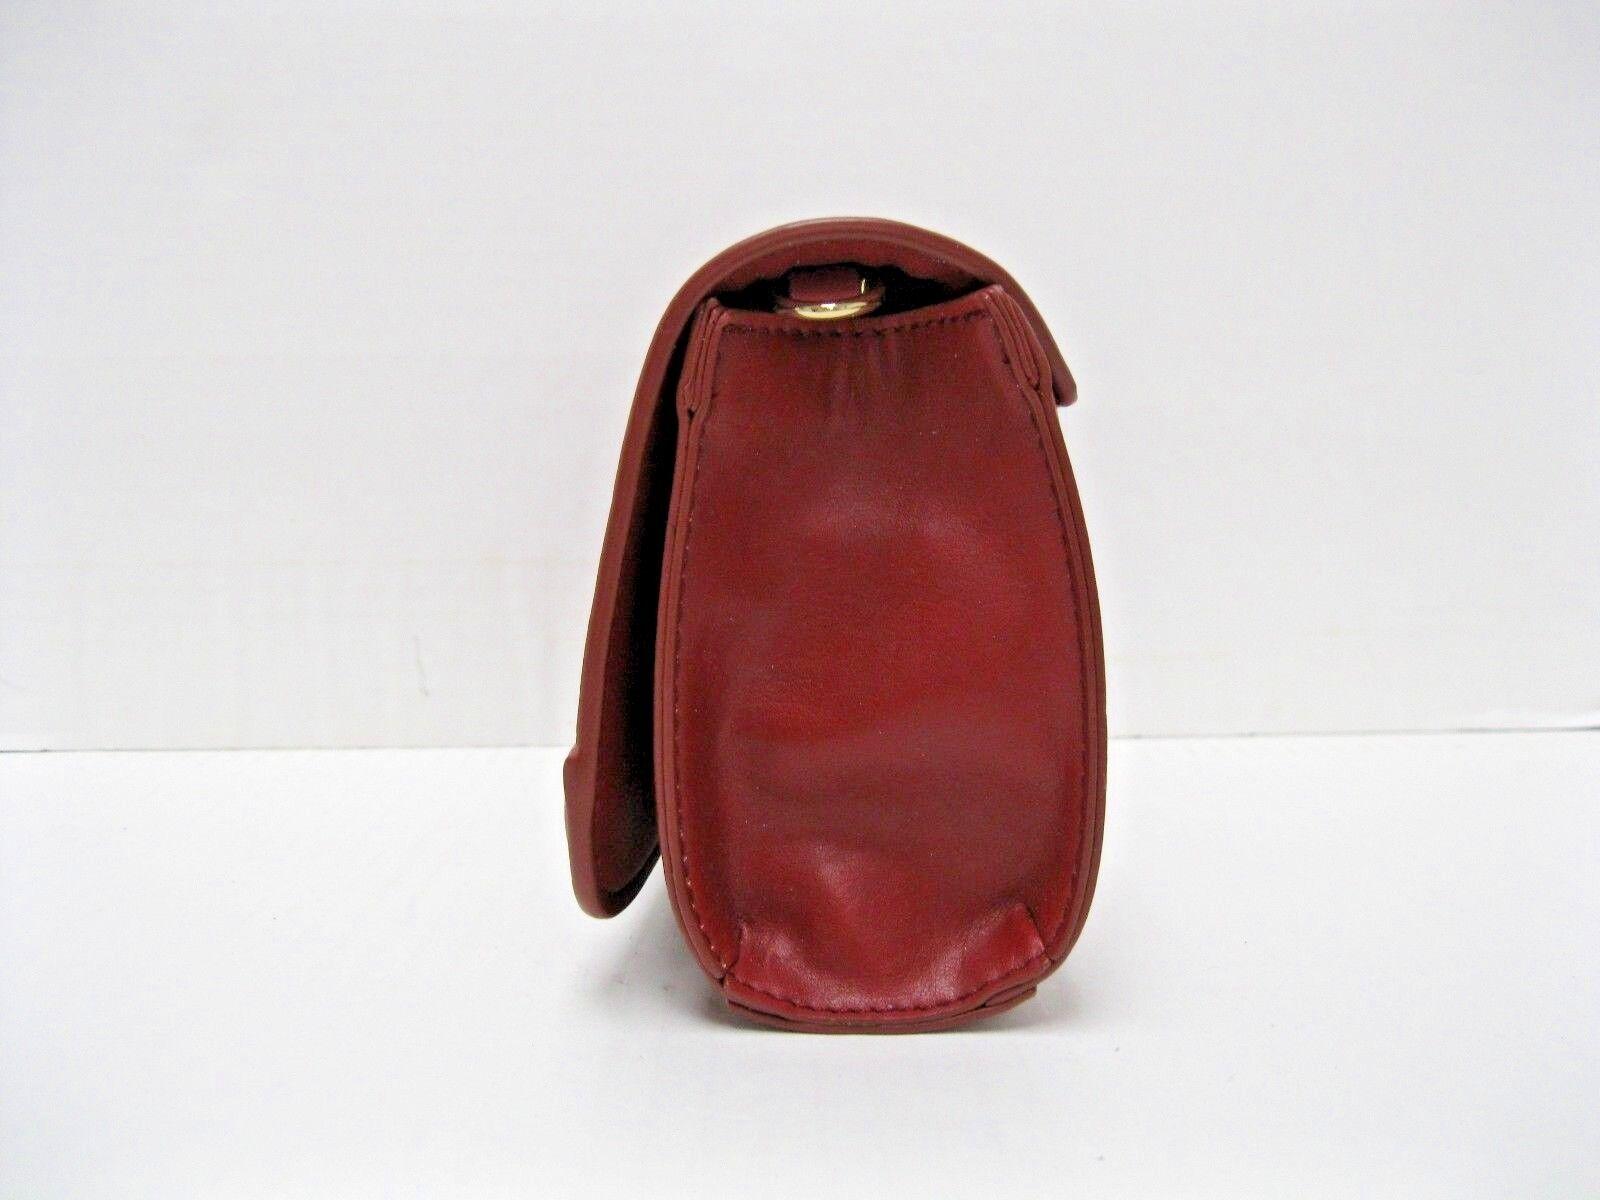 INC Womens Korra Red Faux Leather Grommet Clutch Handbag Purse Small BHFO 6820